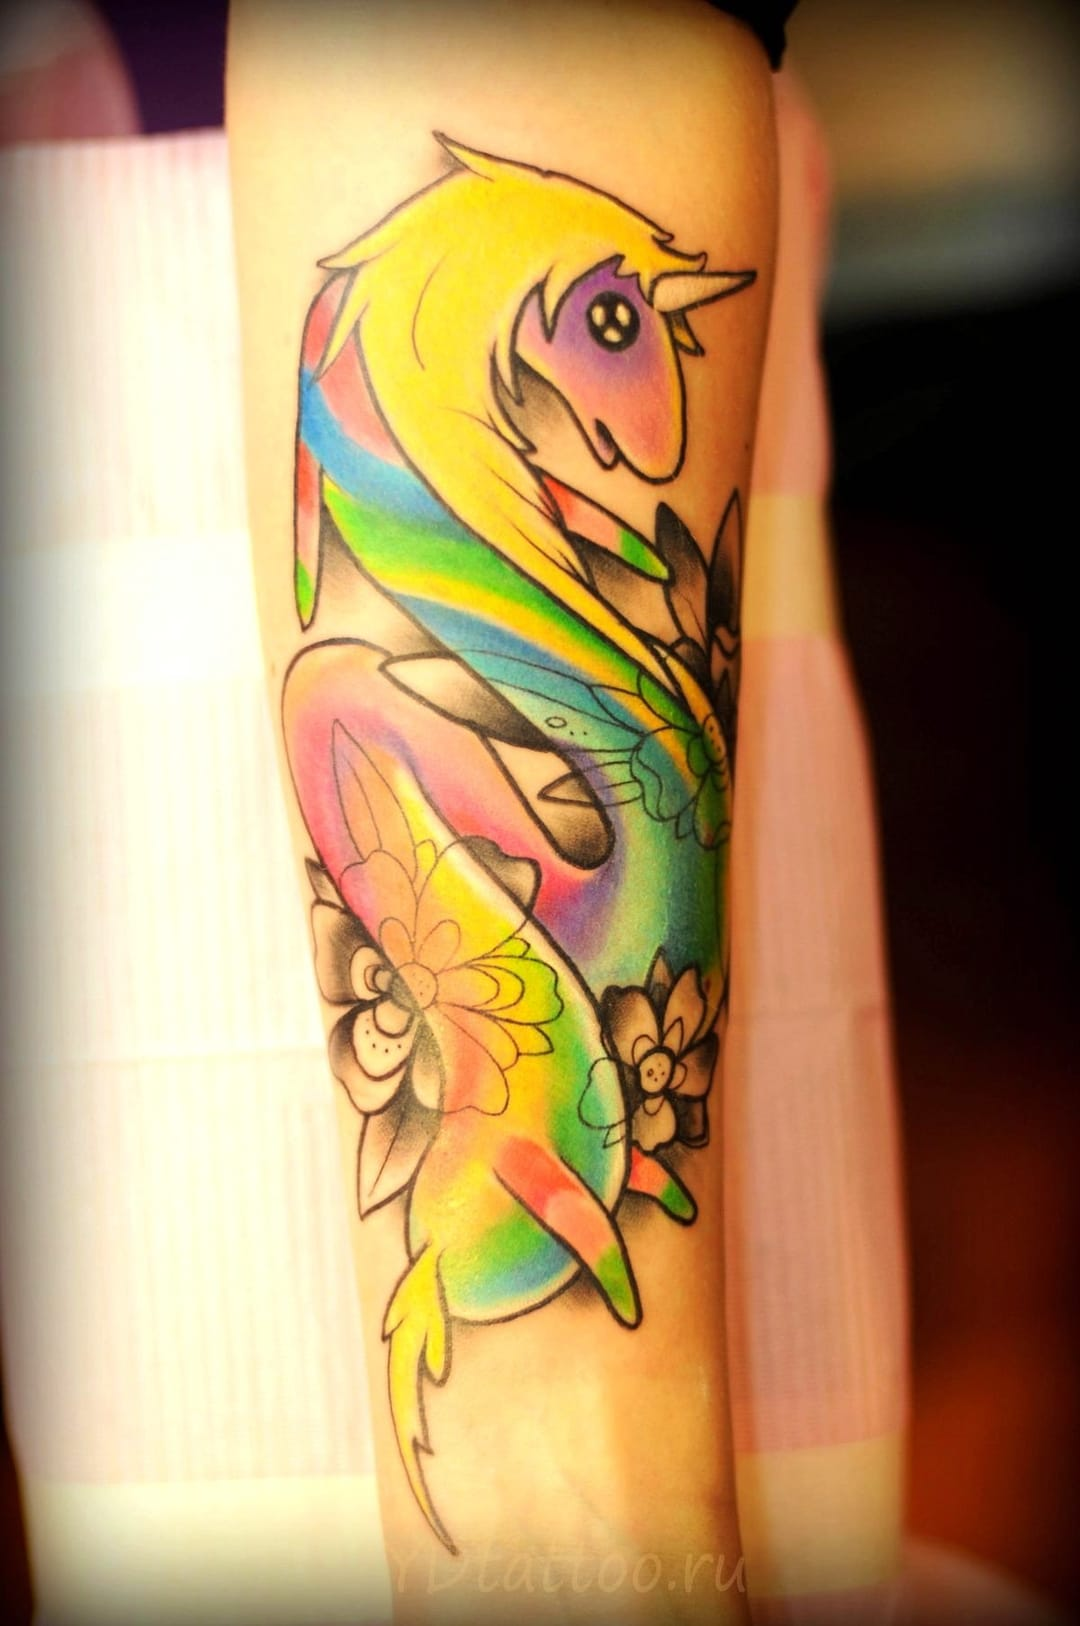 Rainbow unicorn tattoo